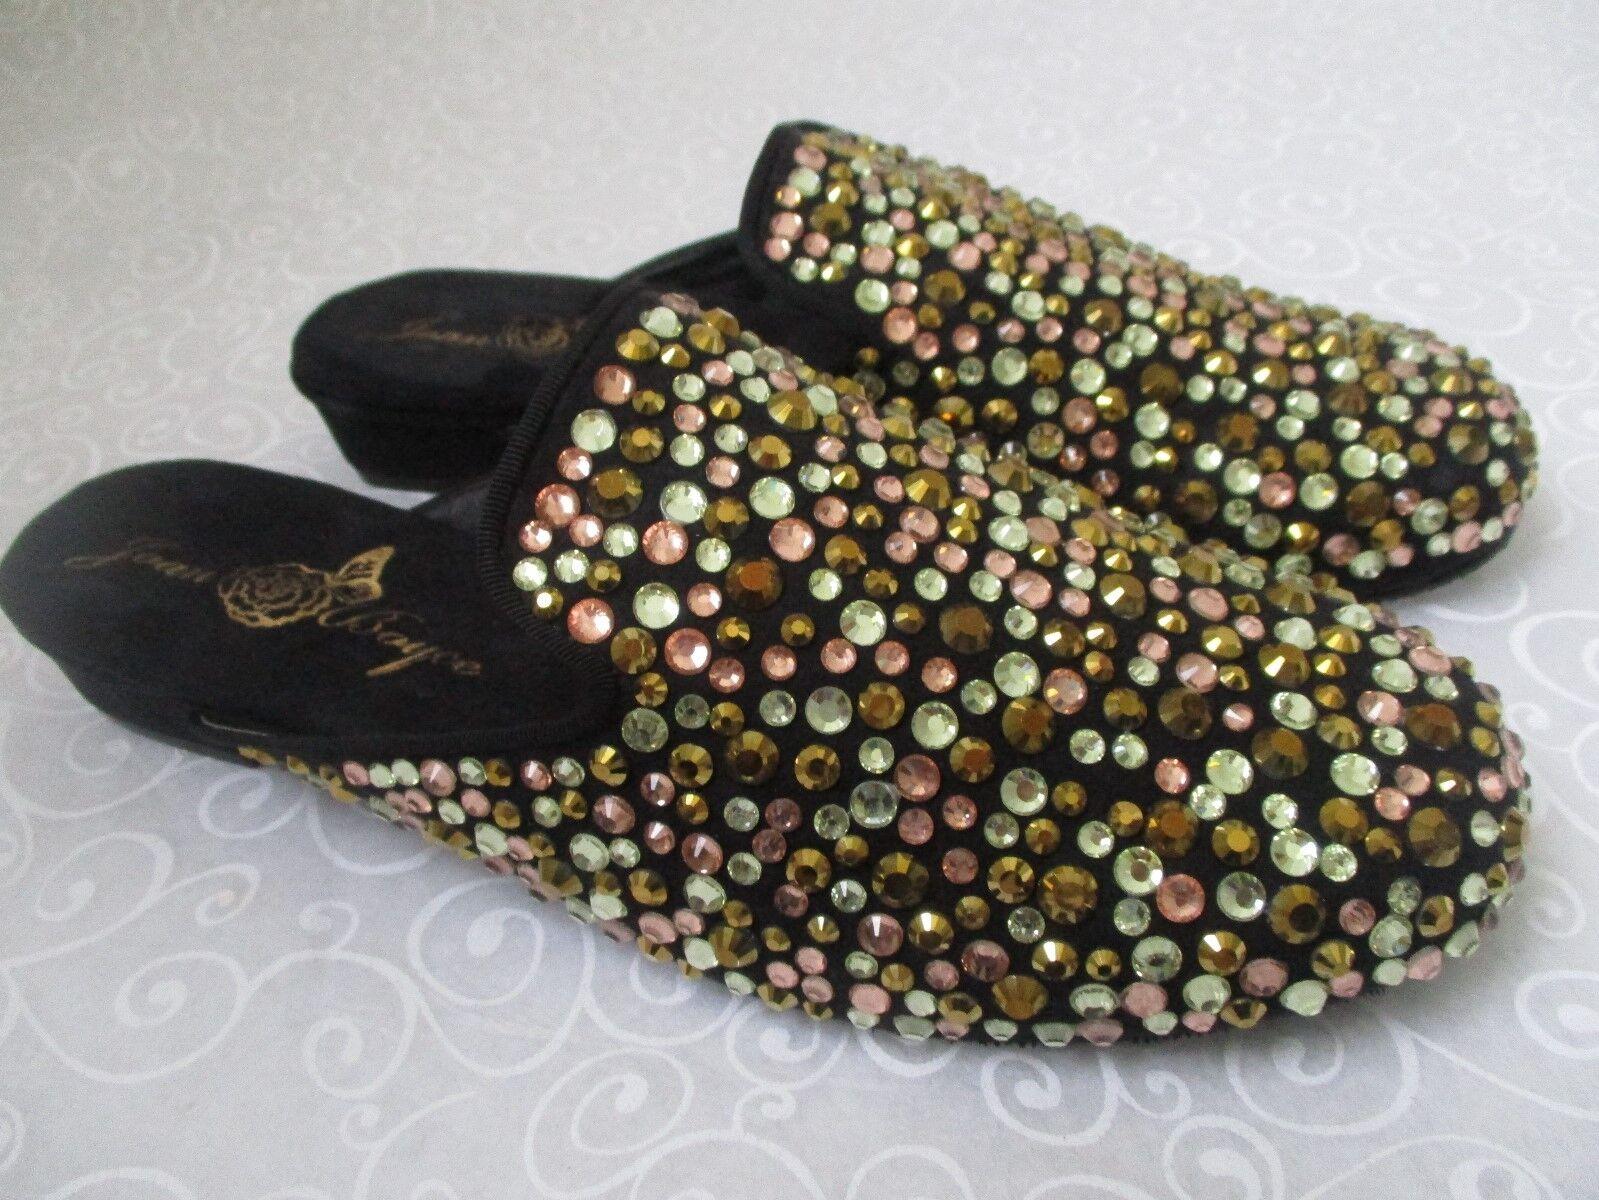 JOAN BOYCE MULTI-COLOR RHINESTONE SLIDES Schuhe SIZE - 8 1/2 M - SIZE NEW f1d490